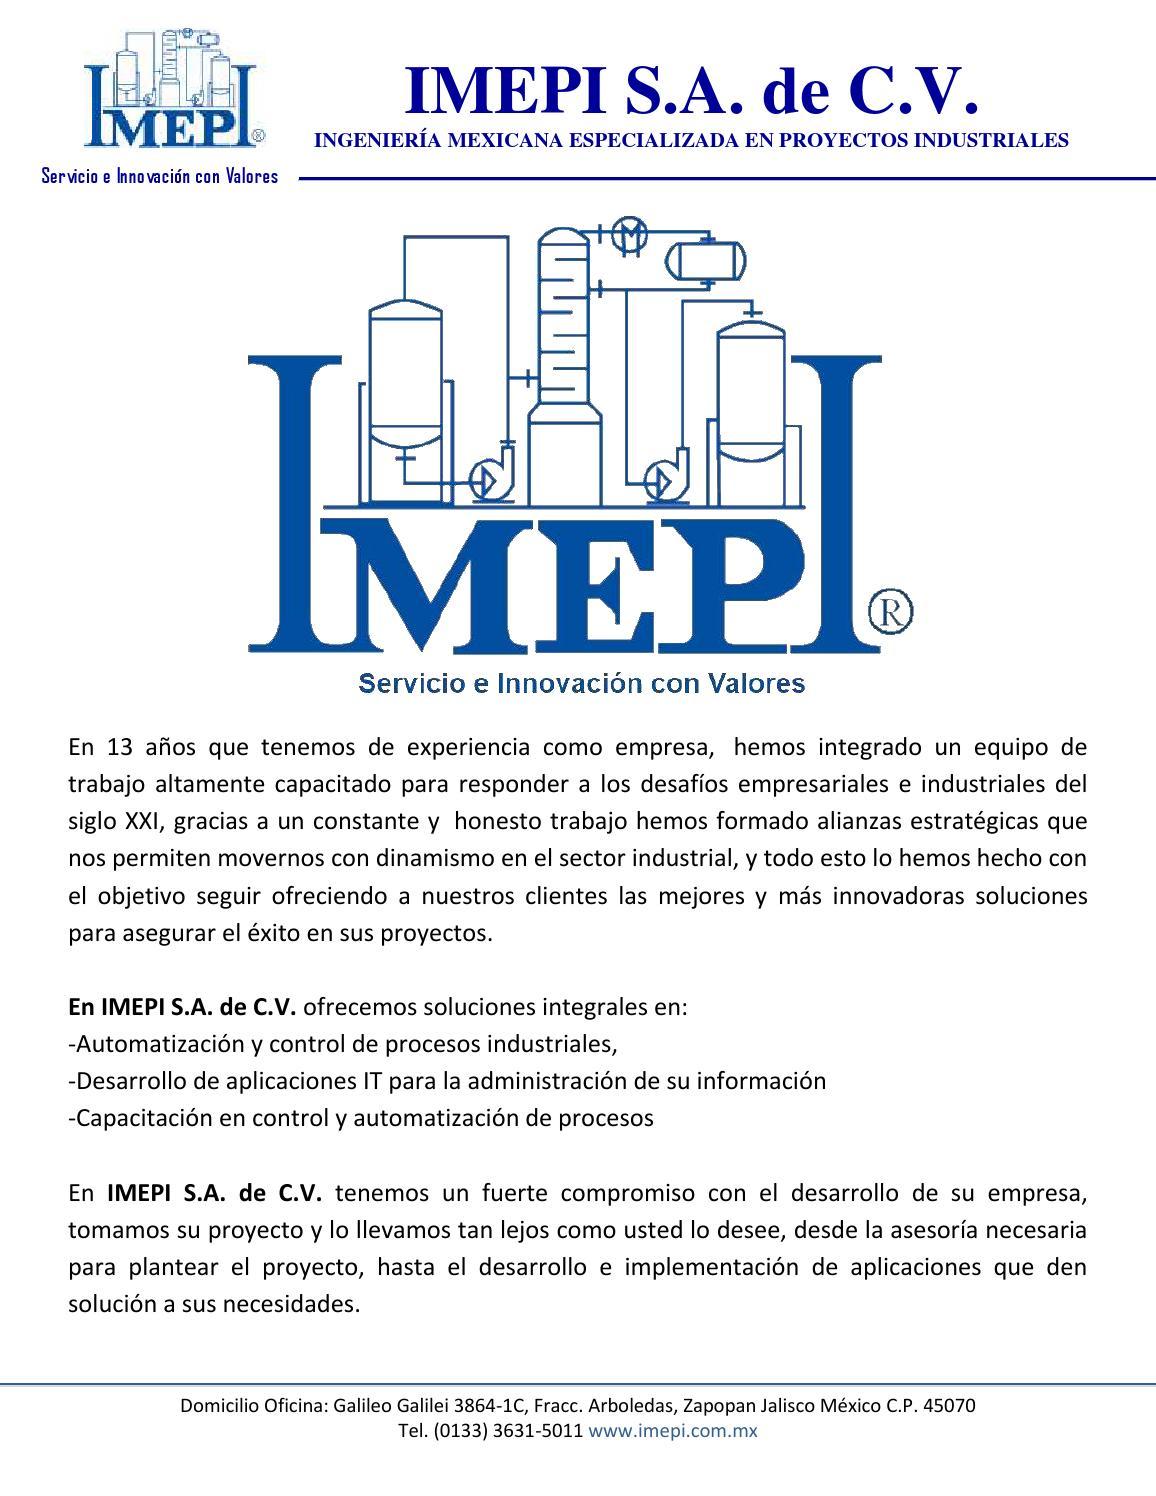 IMEPI S.A. de C.V. by IMEPI - issuu